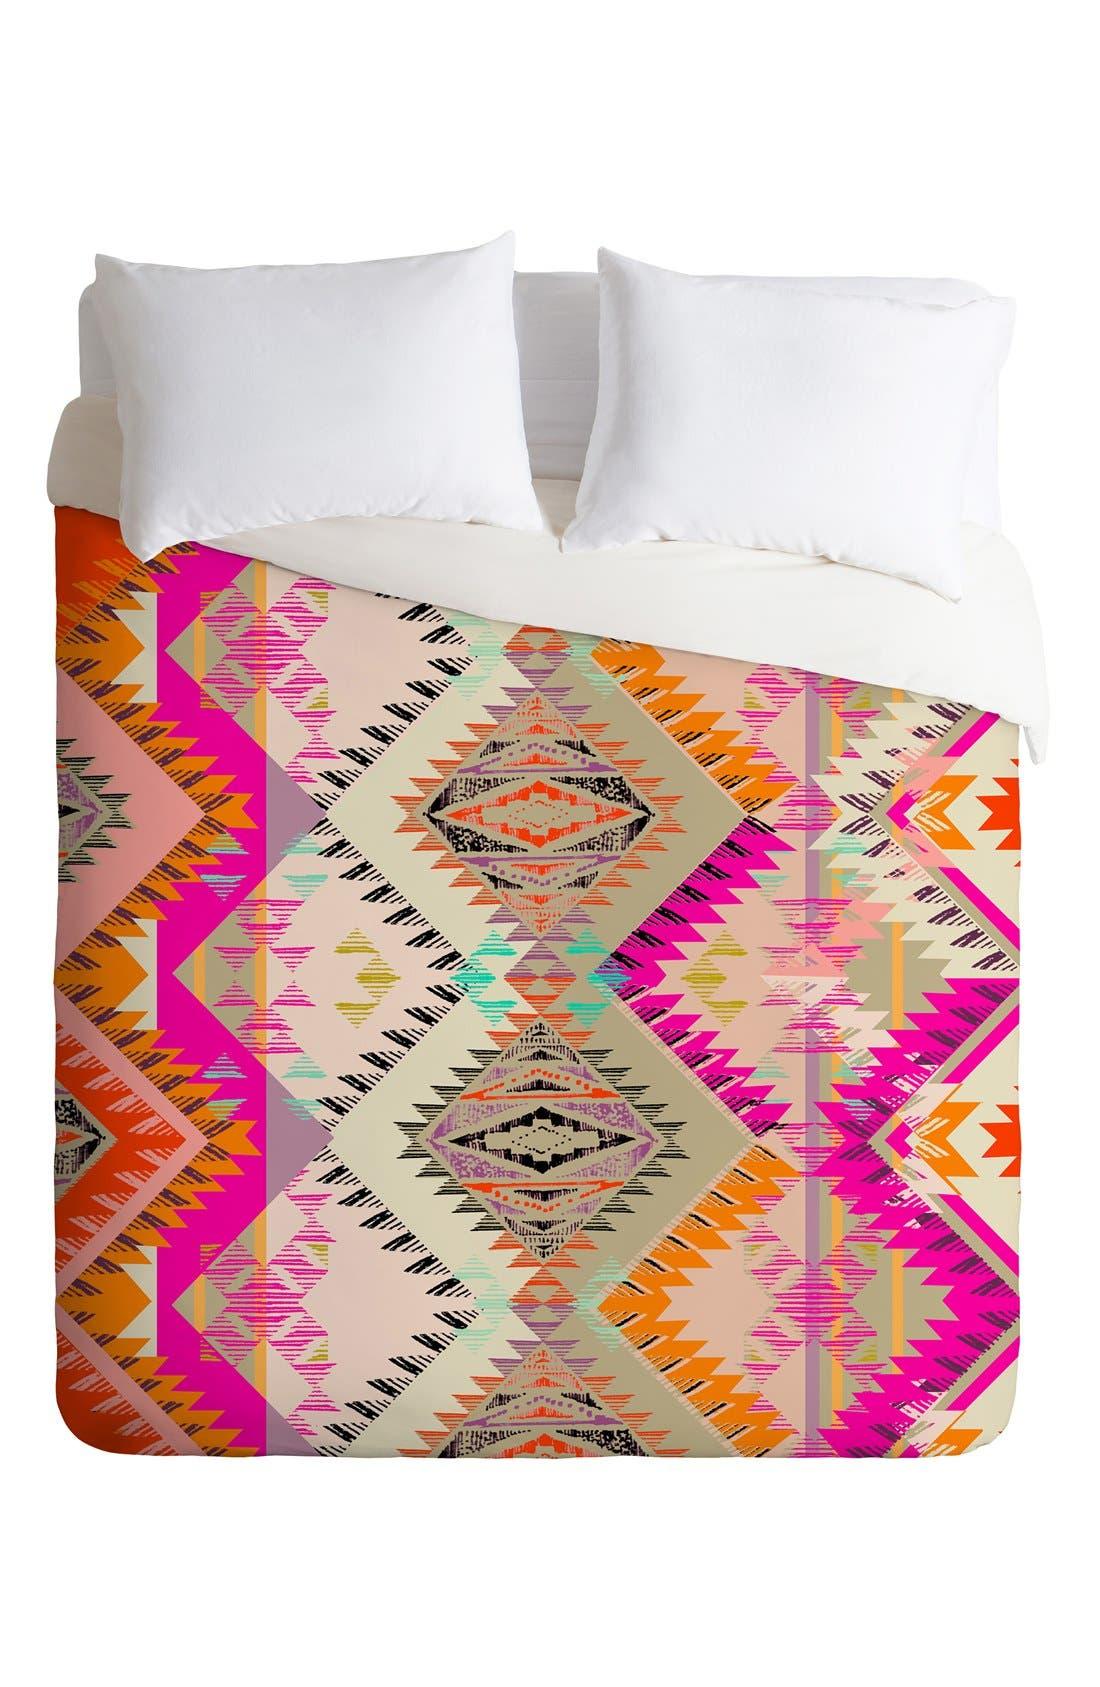 Pattern State Marker Sun Duvet Cover & Sham Set,                             Alternate thumbnail 3, color,                             Pink